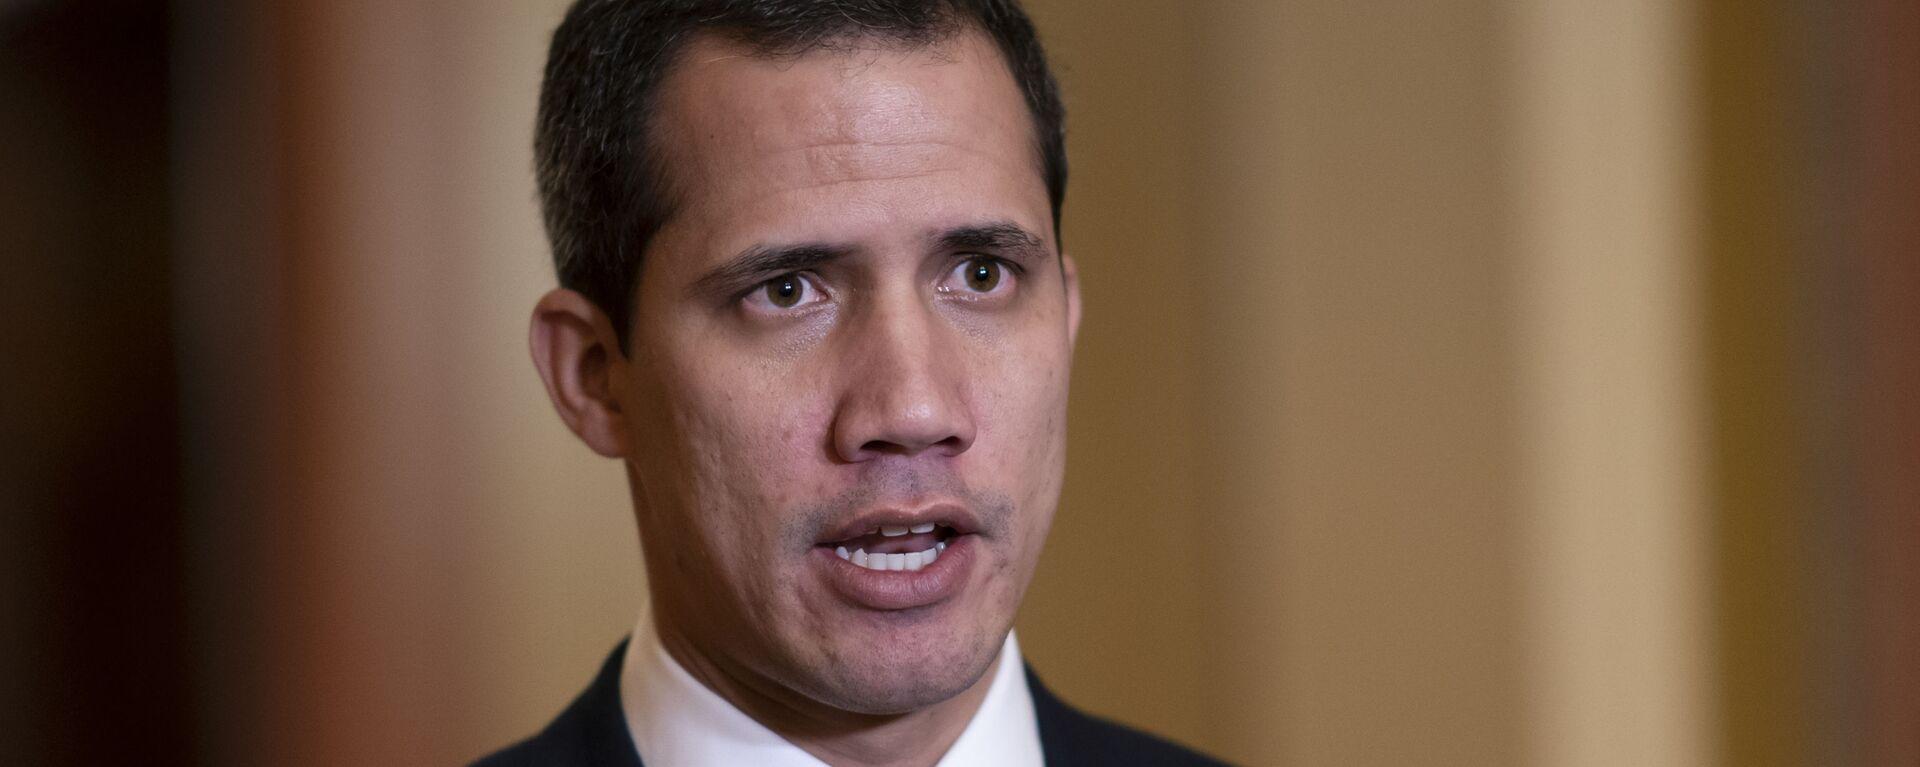 Juan Guaidó, líder de la oposición venezolana - Sputnik Mundo, 1920, 11.05.2021